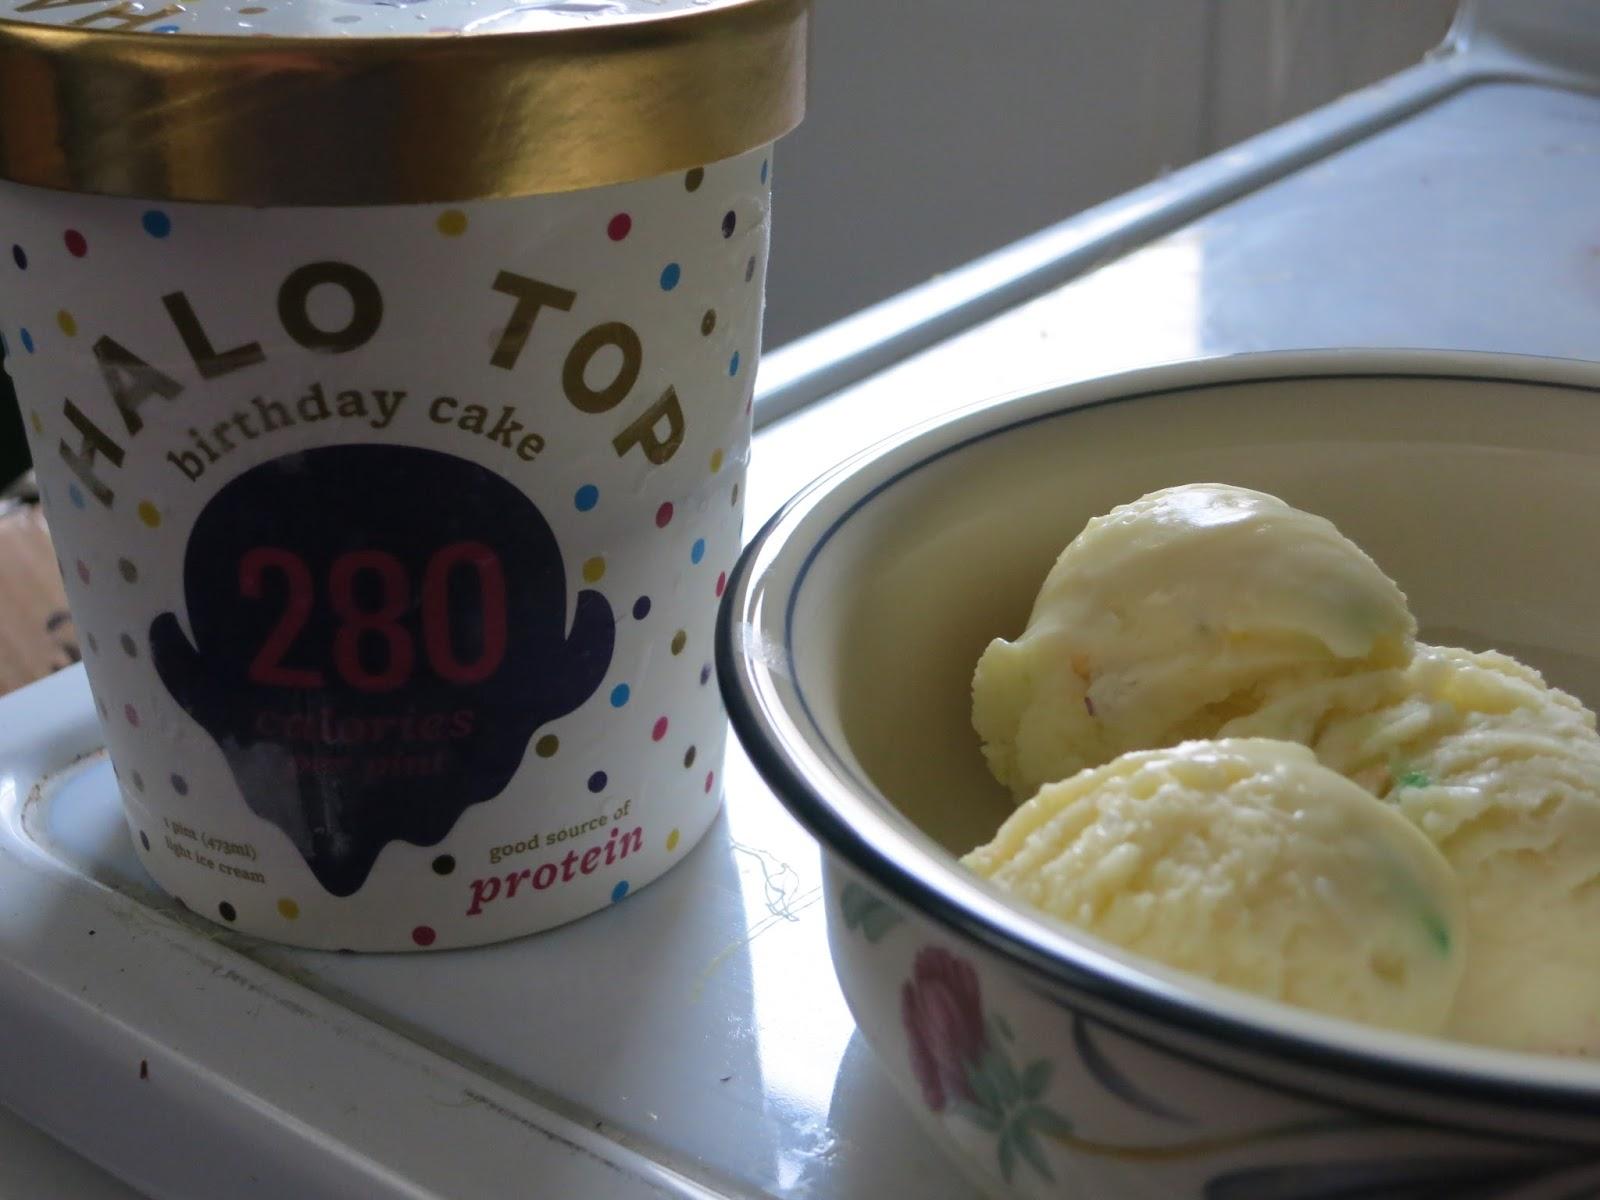 Susans Disney Family Halo Top healthy Ice Cream that actually